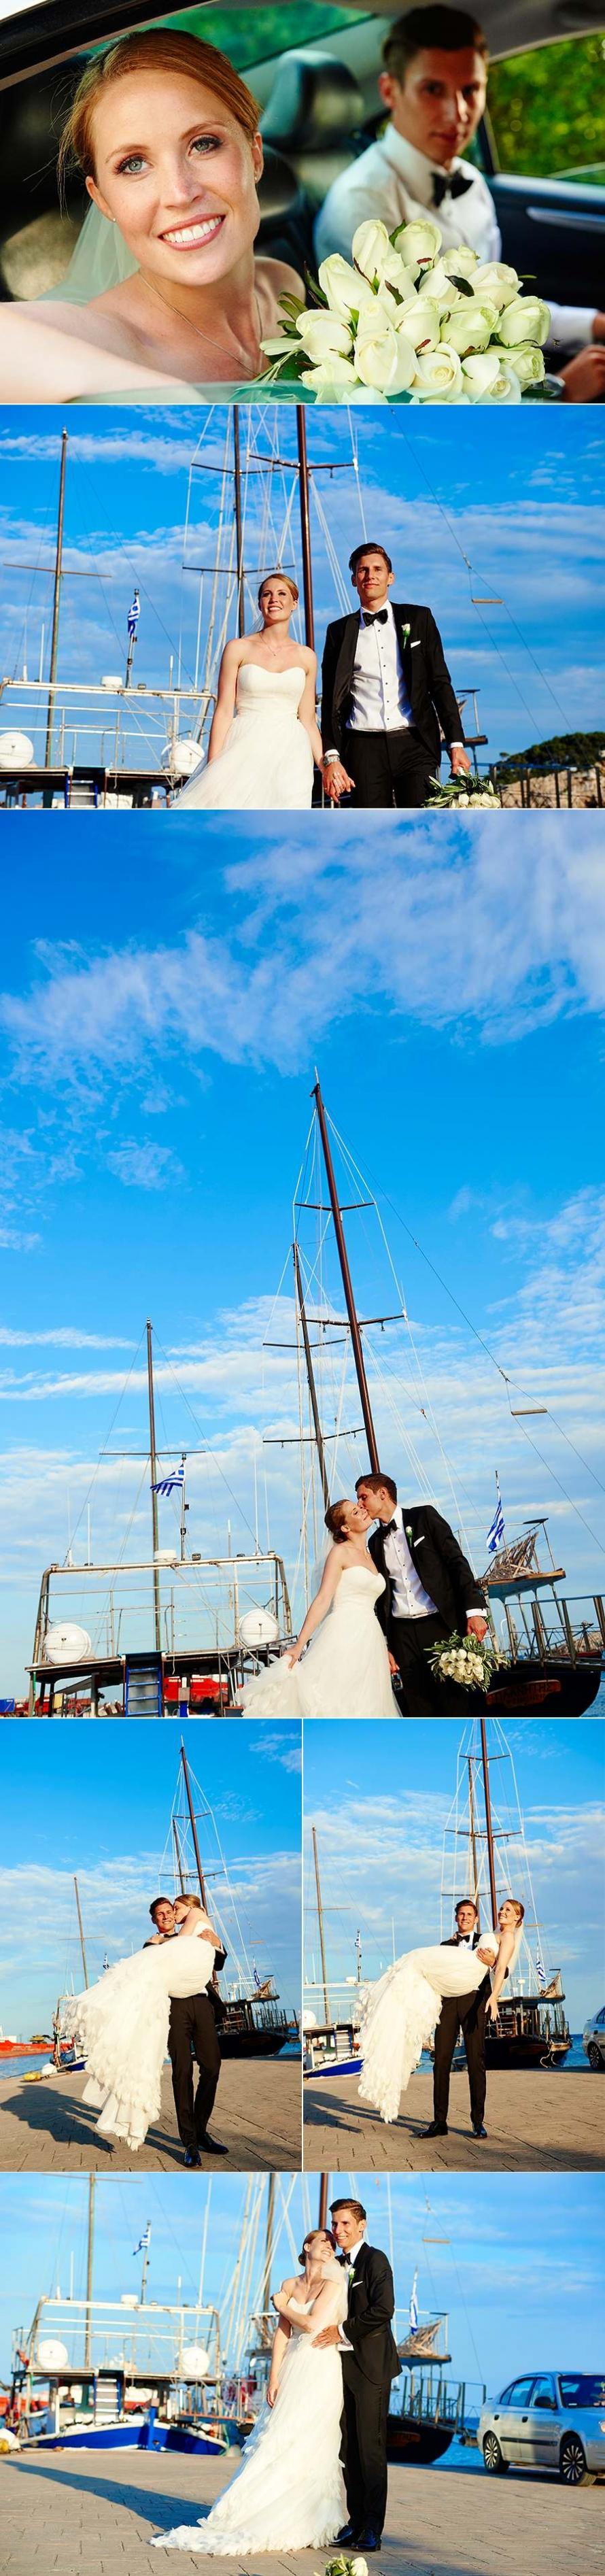 Tobi & Vanessa wedding photos 19